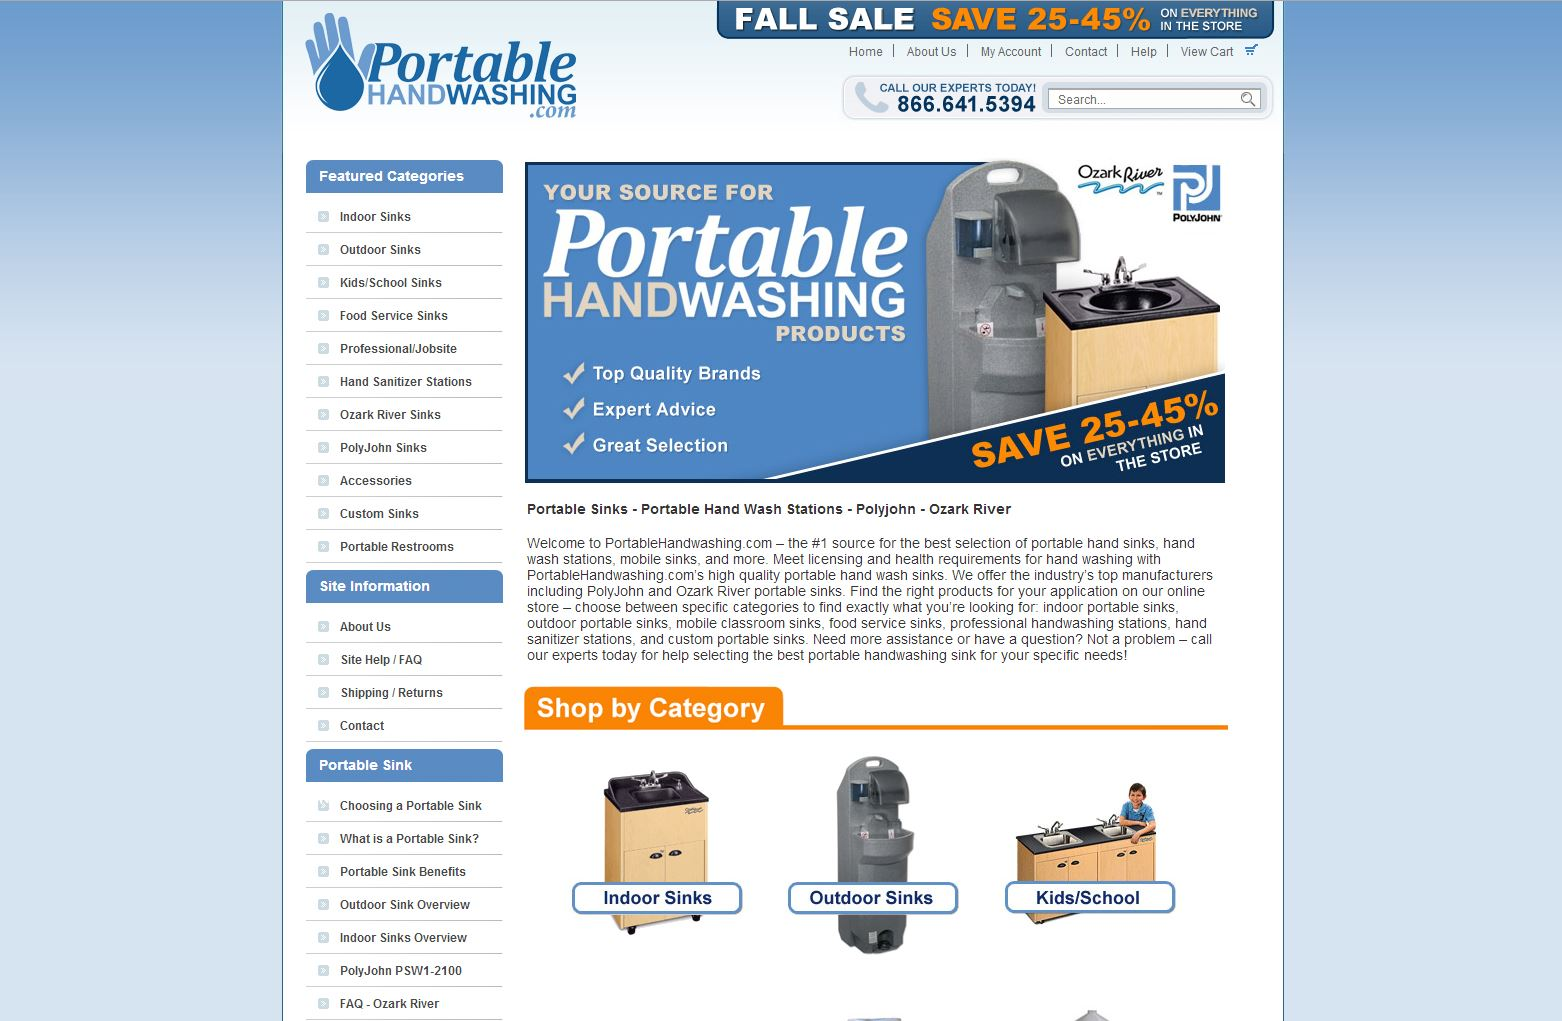 PortableHandwas